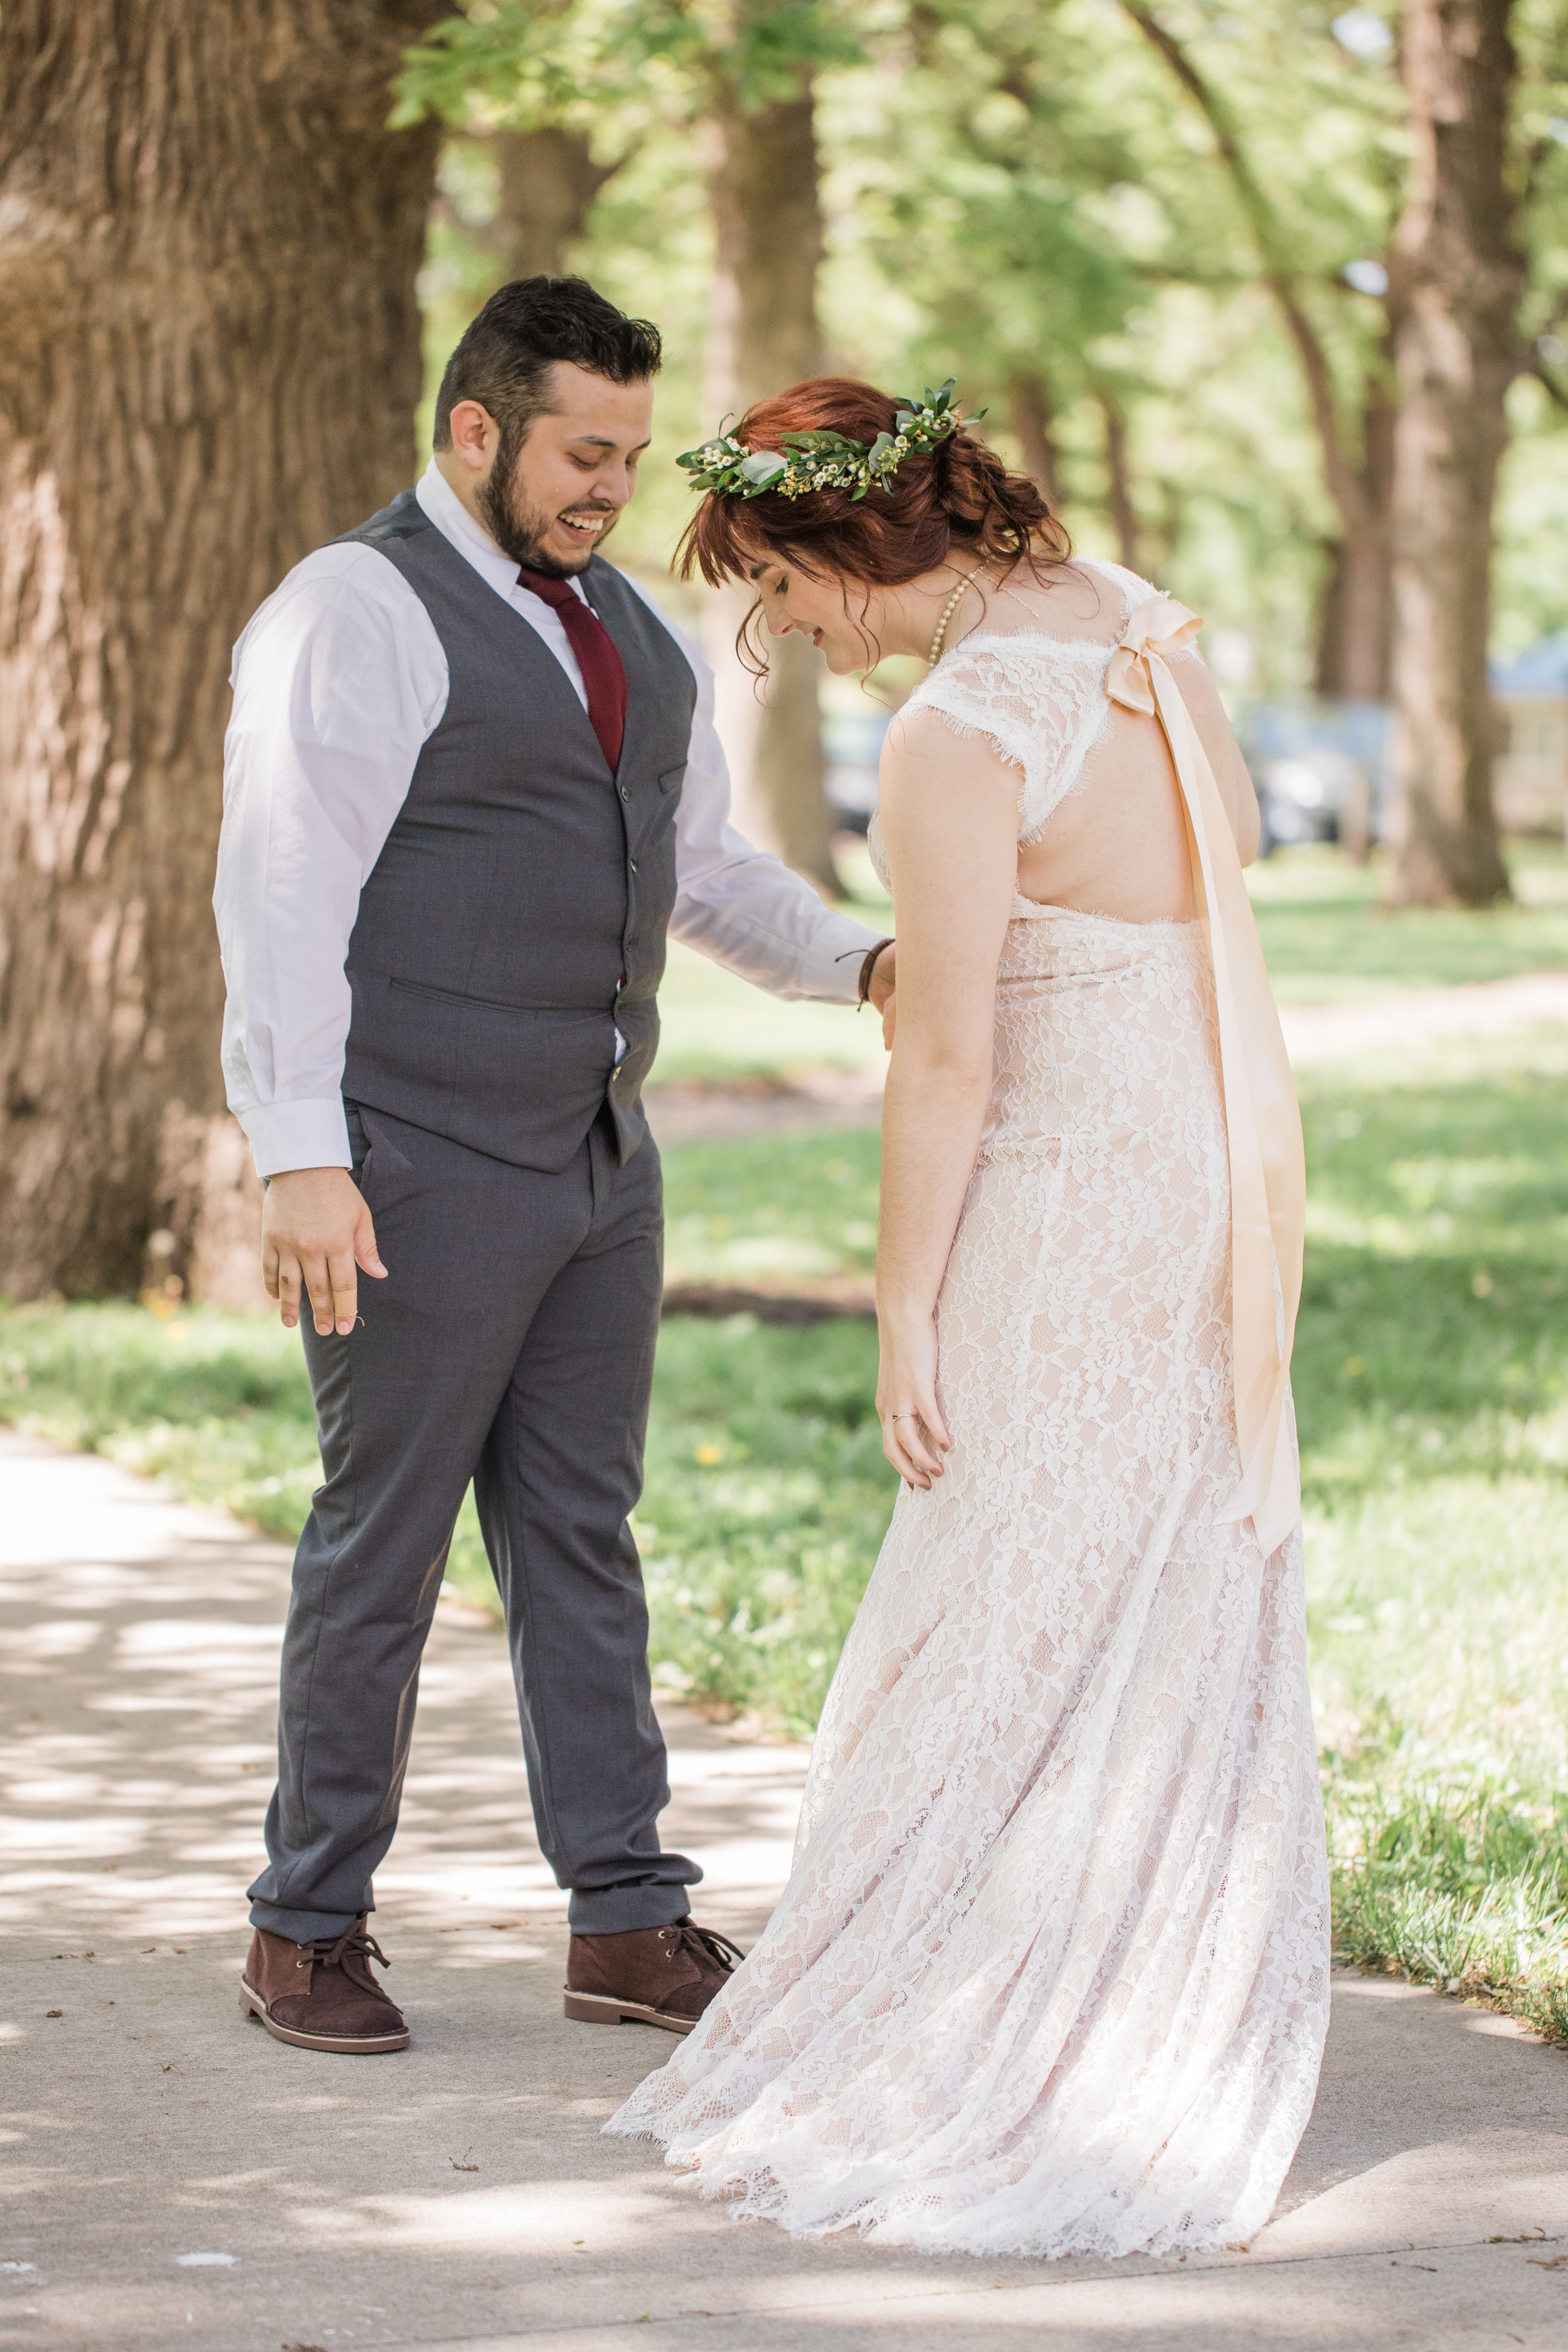 iowa-weddings-first-look-Morganne-Bobby-wedding-141.jpg